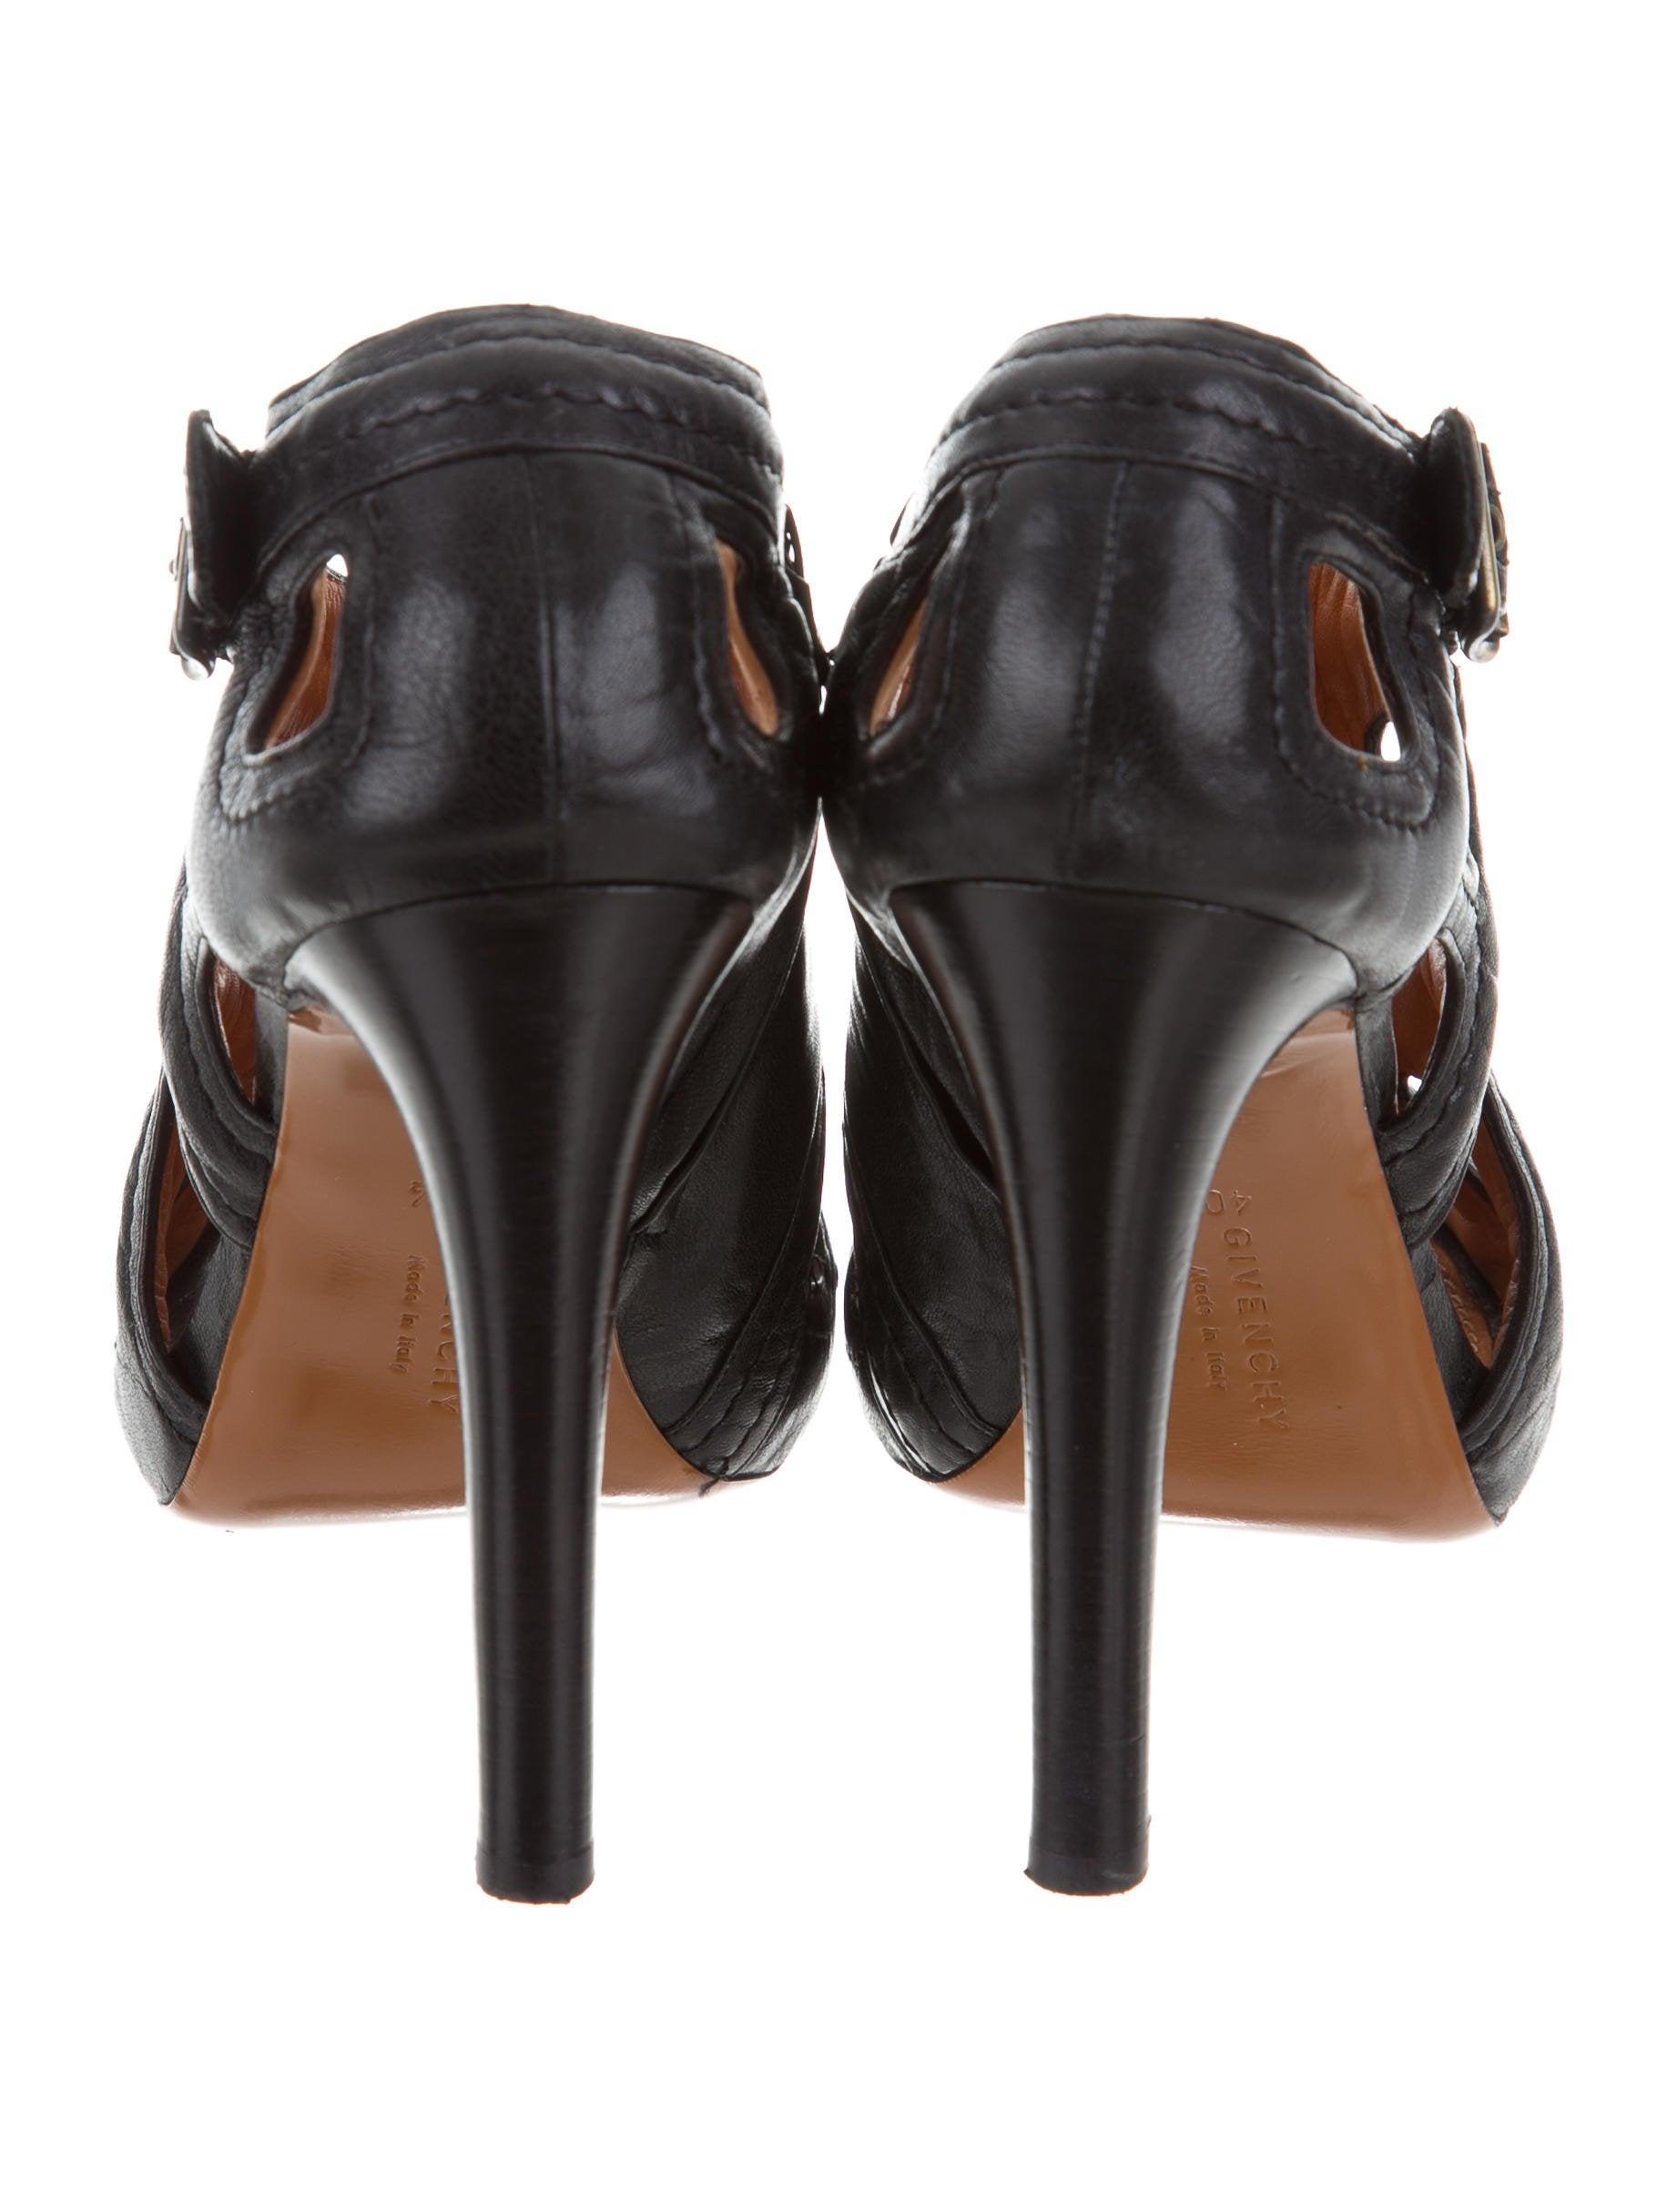 Givenchy Cutout Peep-Toe Pumps pick a best free shipping cheap online sale Cheapest sale marketable S6q0Jk